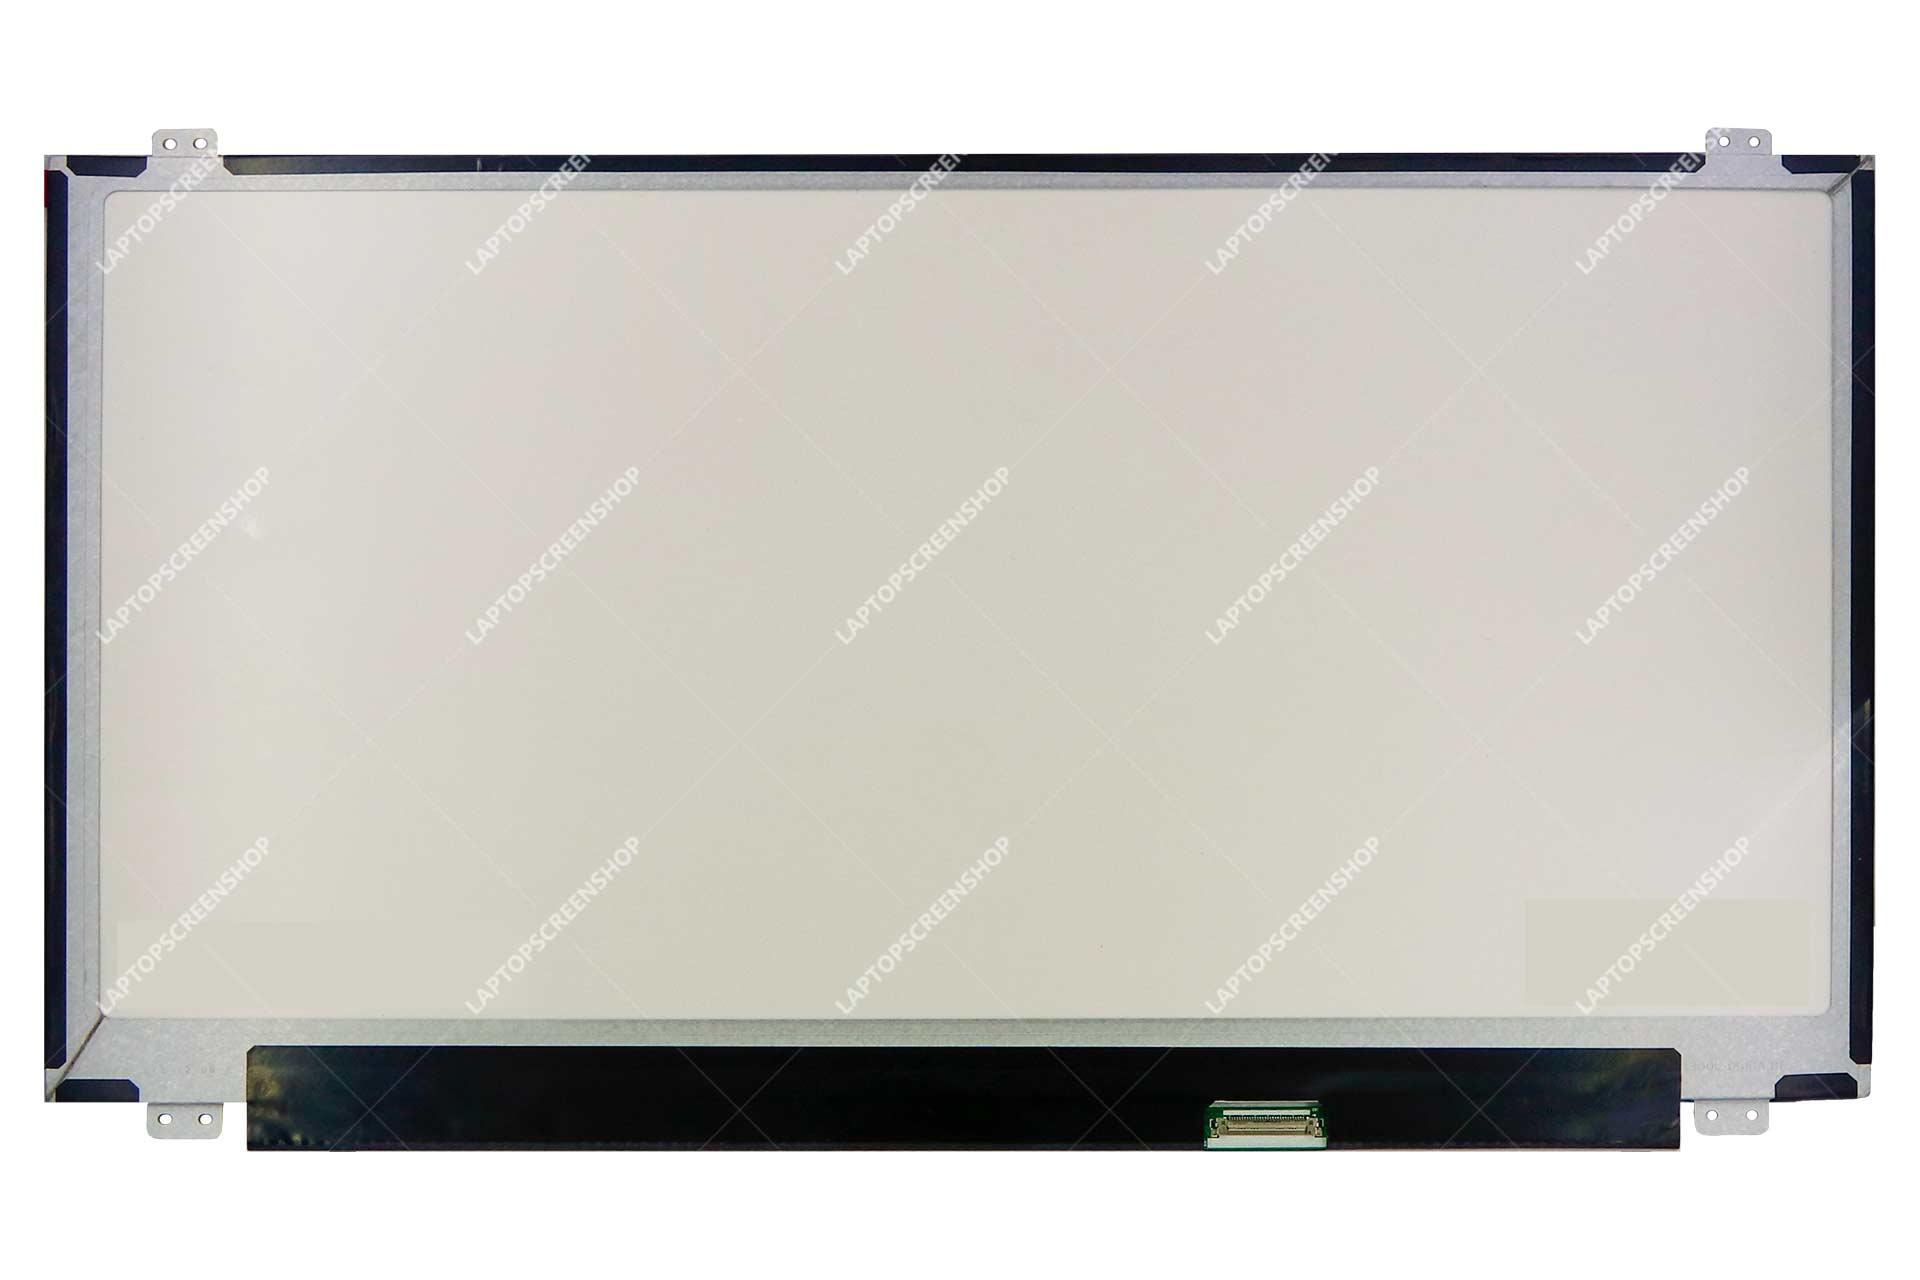 ACER-ASPIRE-E1-532-P436-LCD |HD|فروشگاه لپ تاپ اسکرين | تعمير لپ تاپ